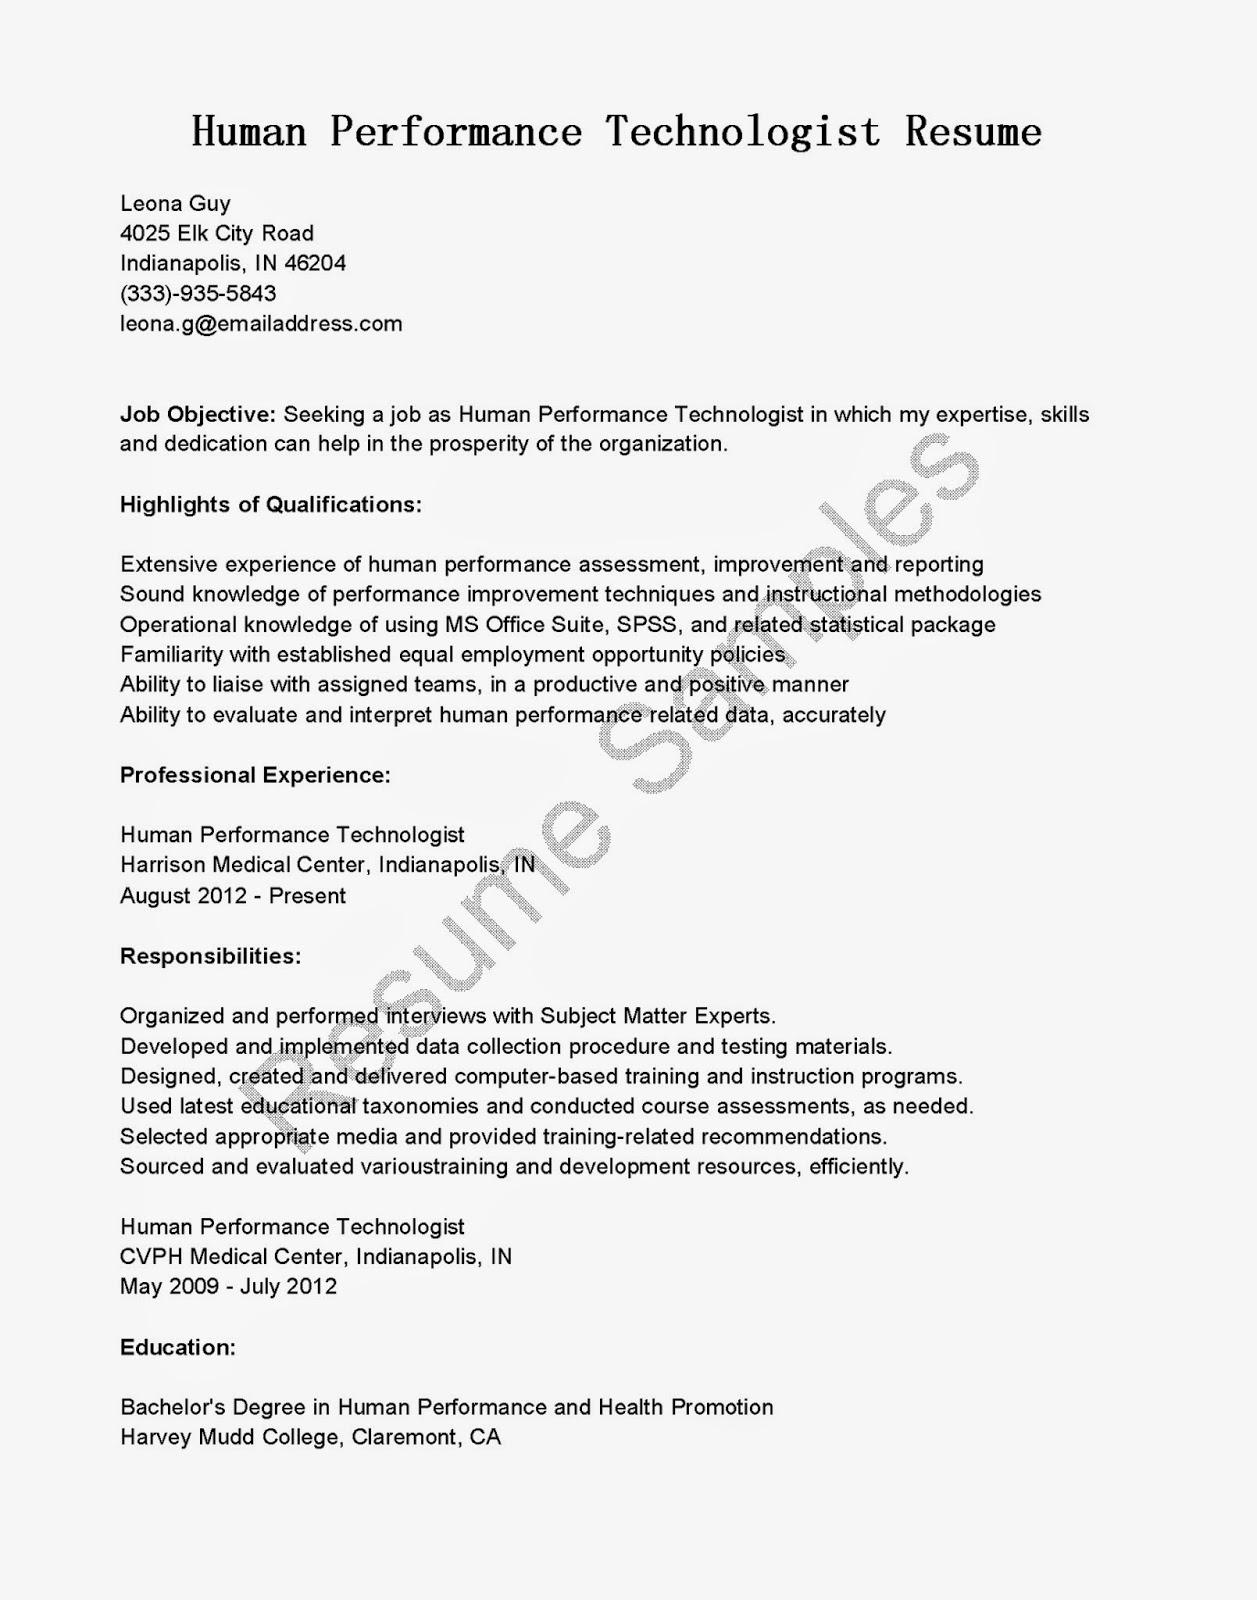 resume samples  human performance technologist resume sample